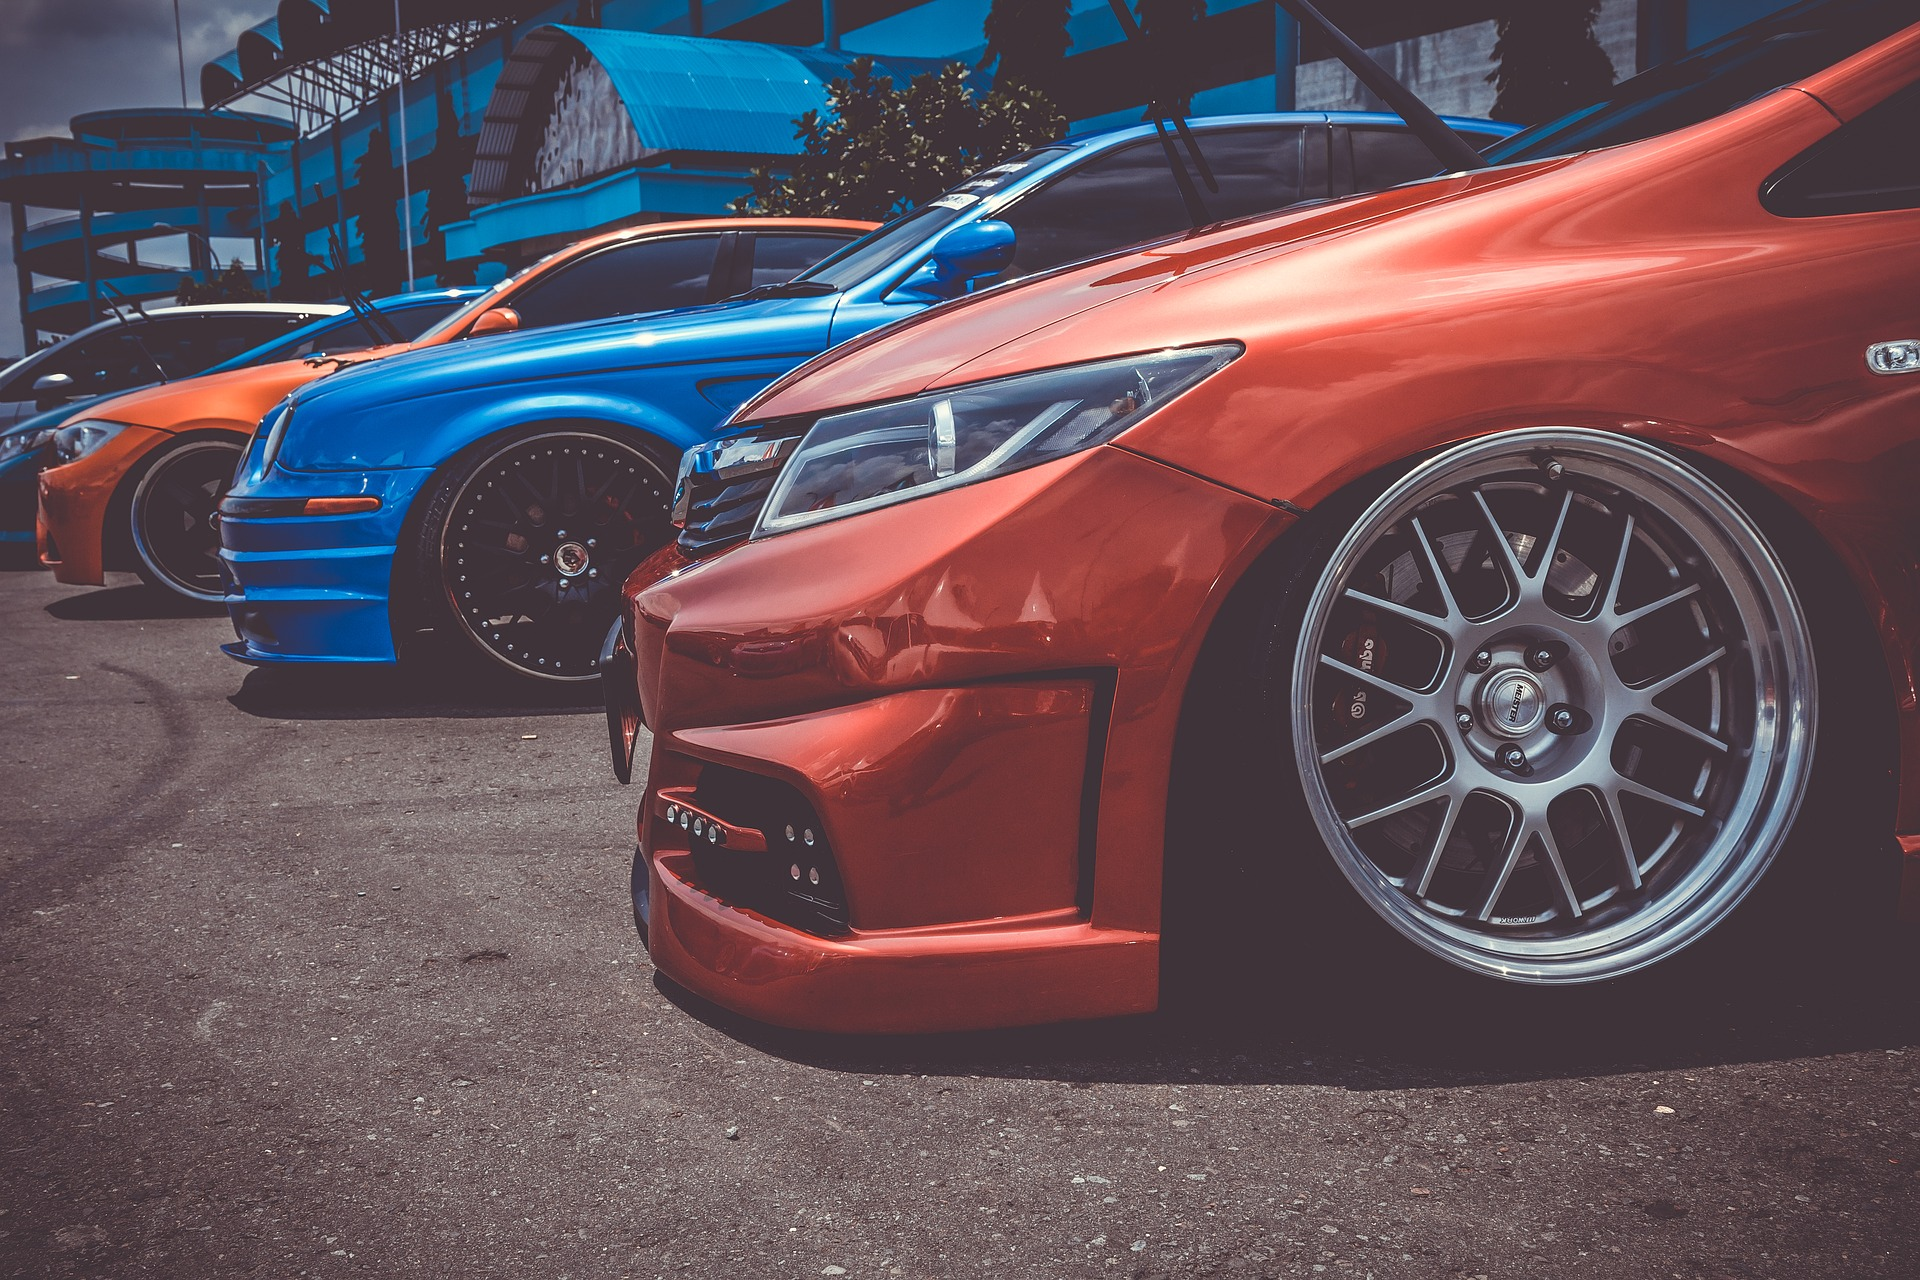 skup samochodowy